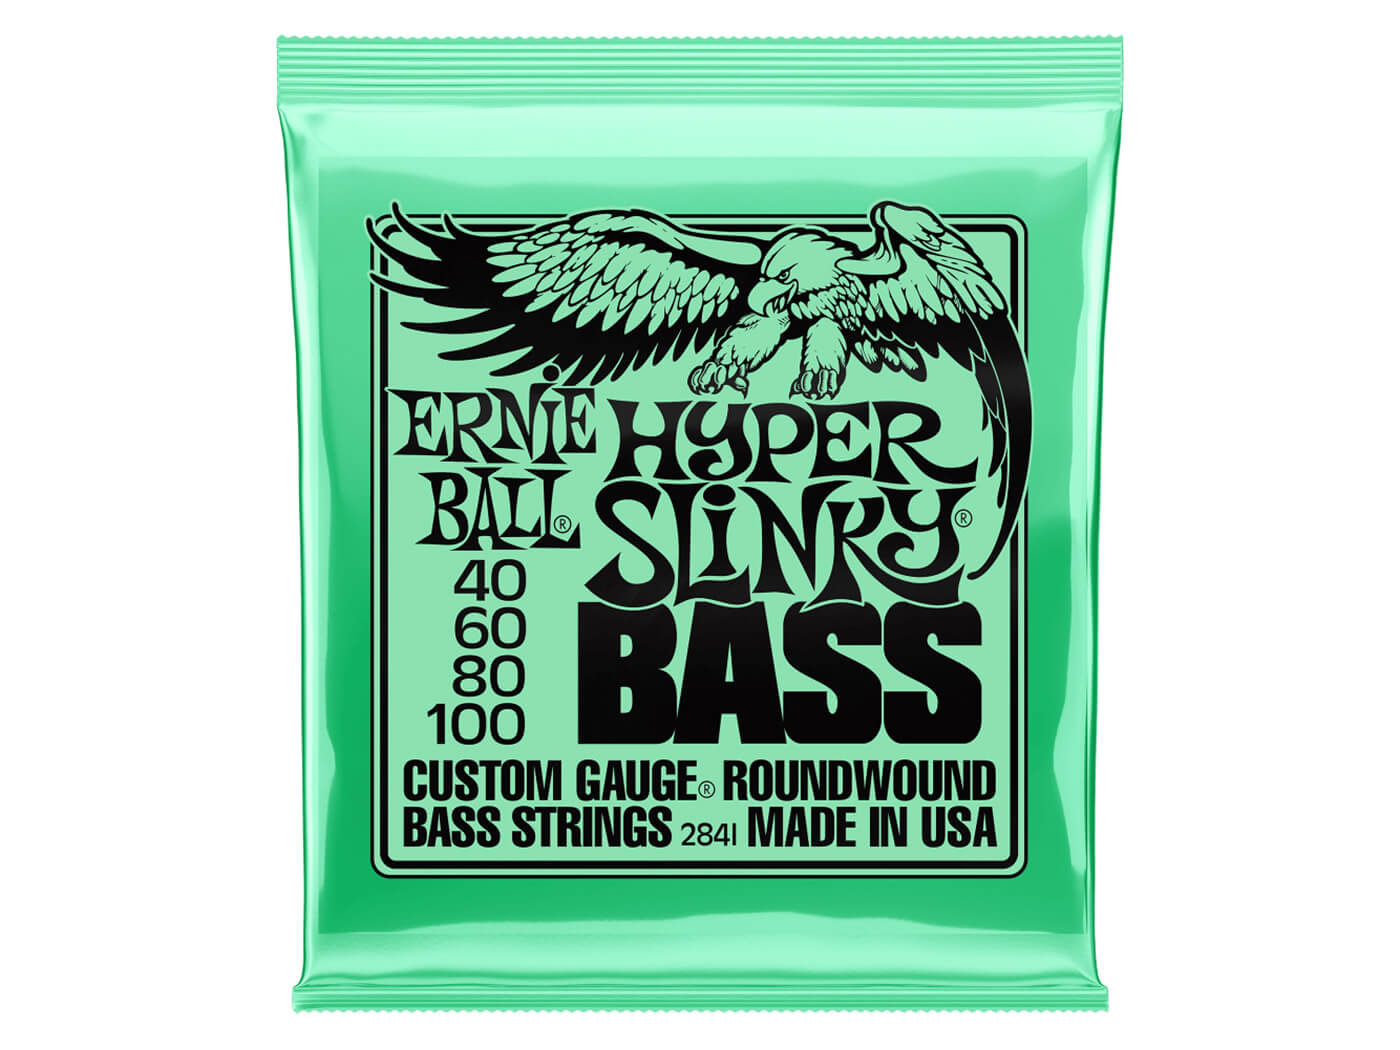 Ernie Ball Hyper Slinky Bass Nickel Wound Electric Bass Strings